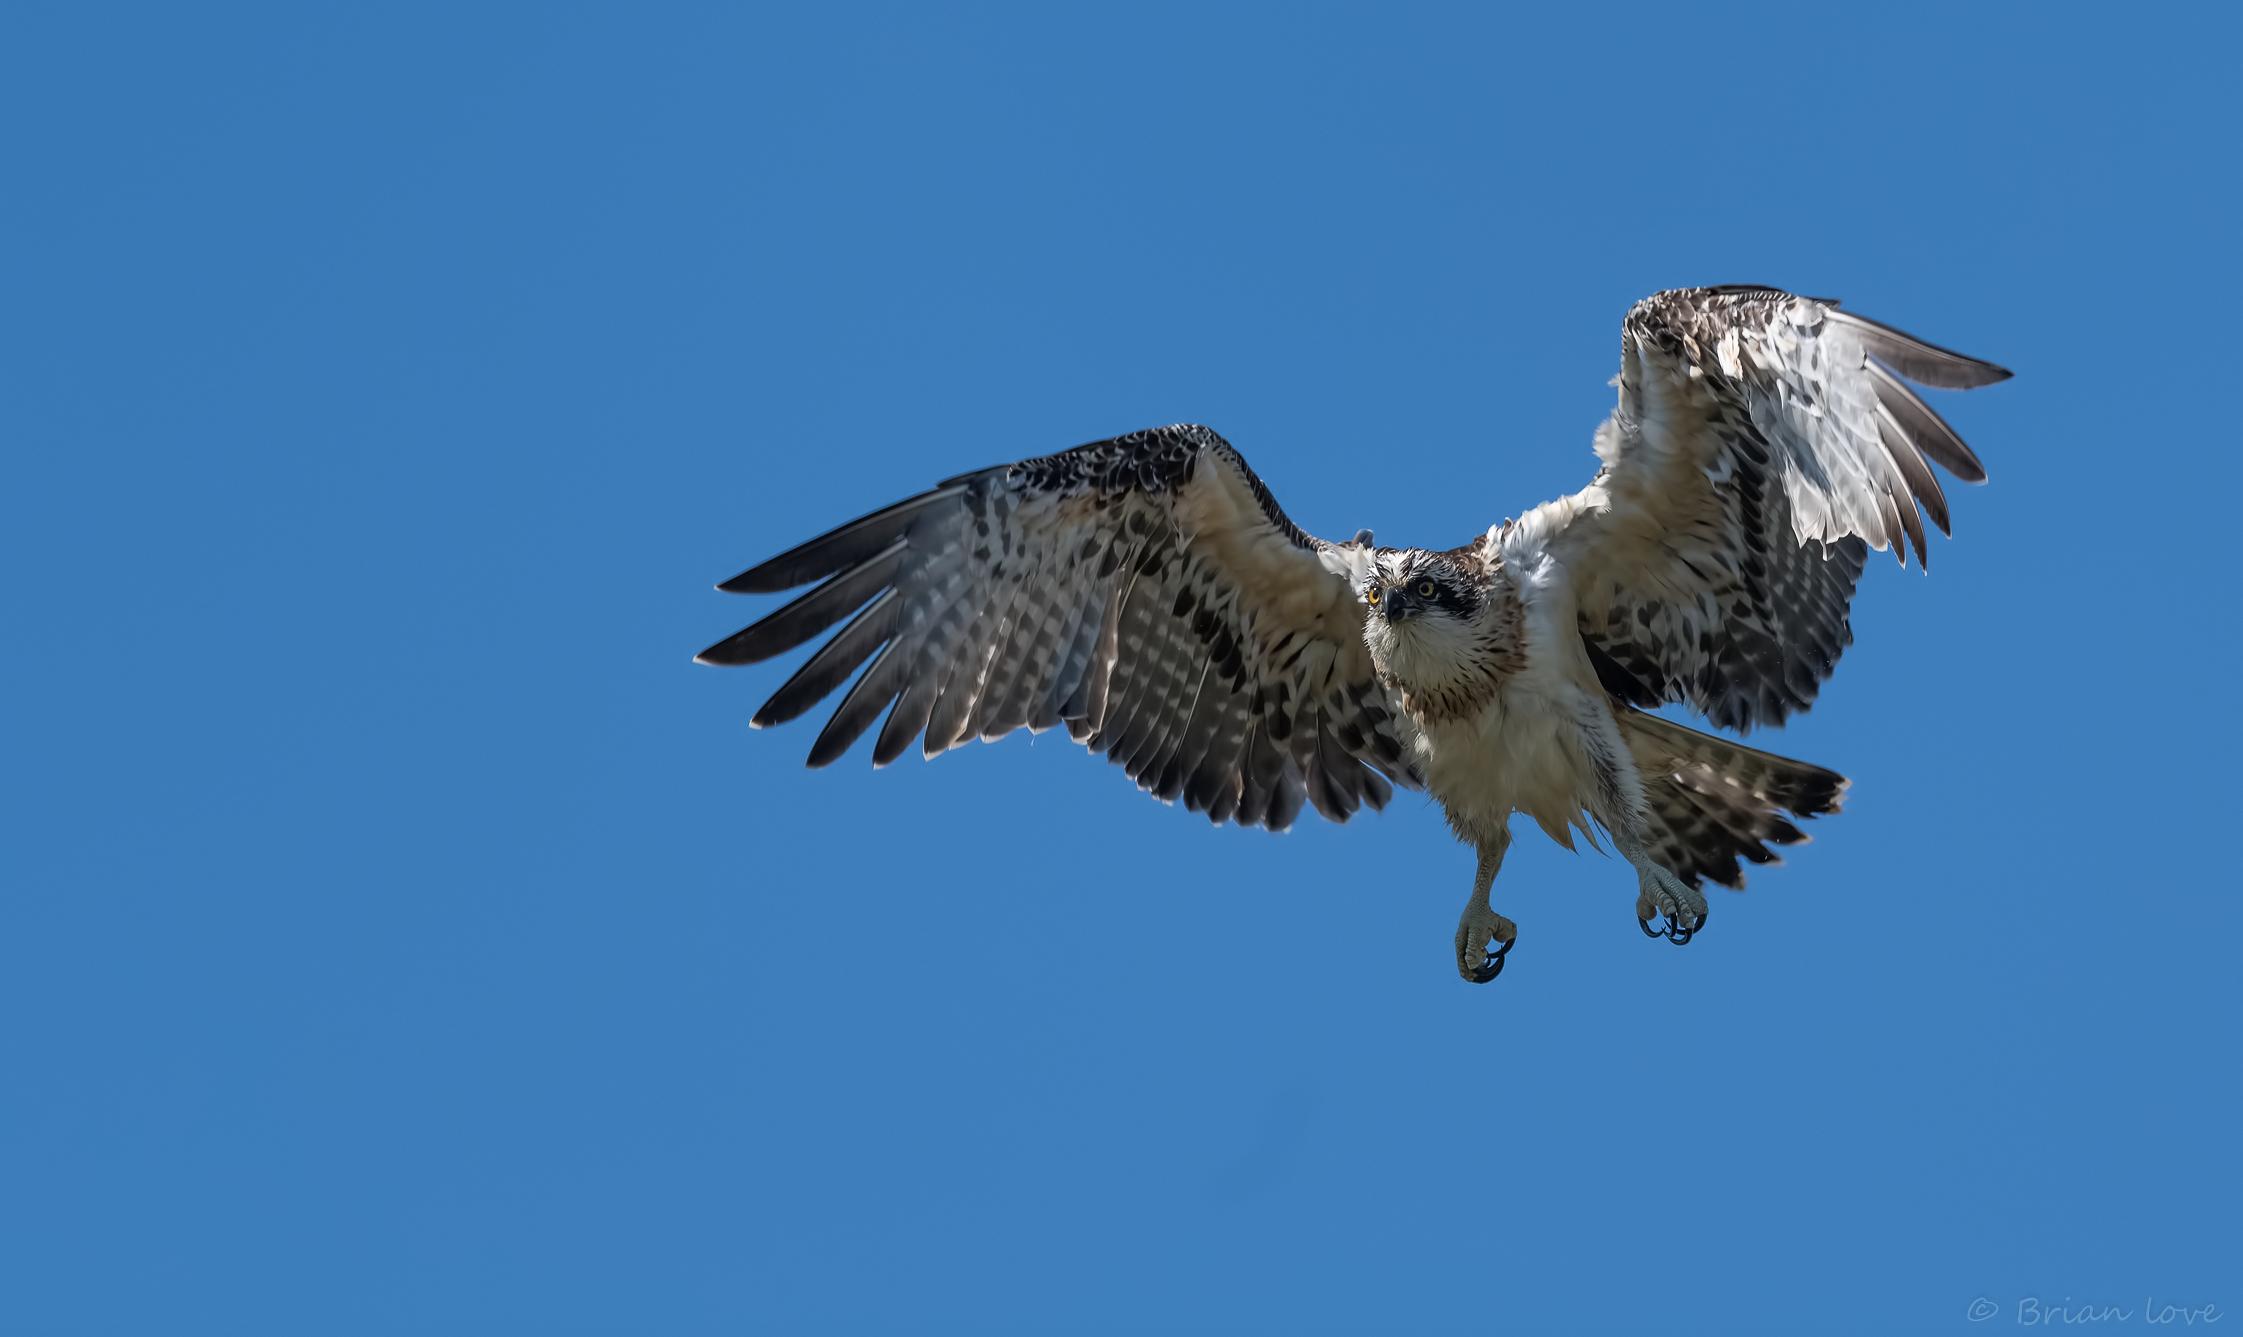 Returning to the nest...